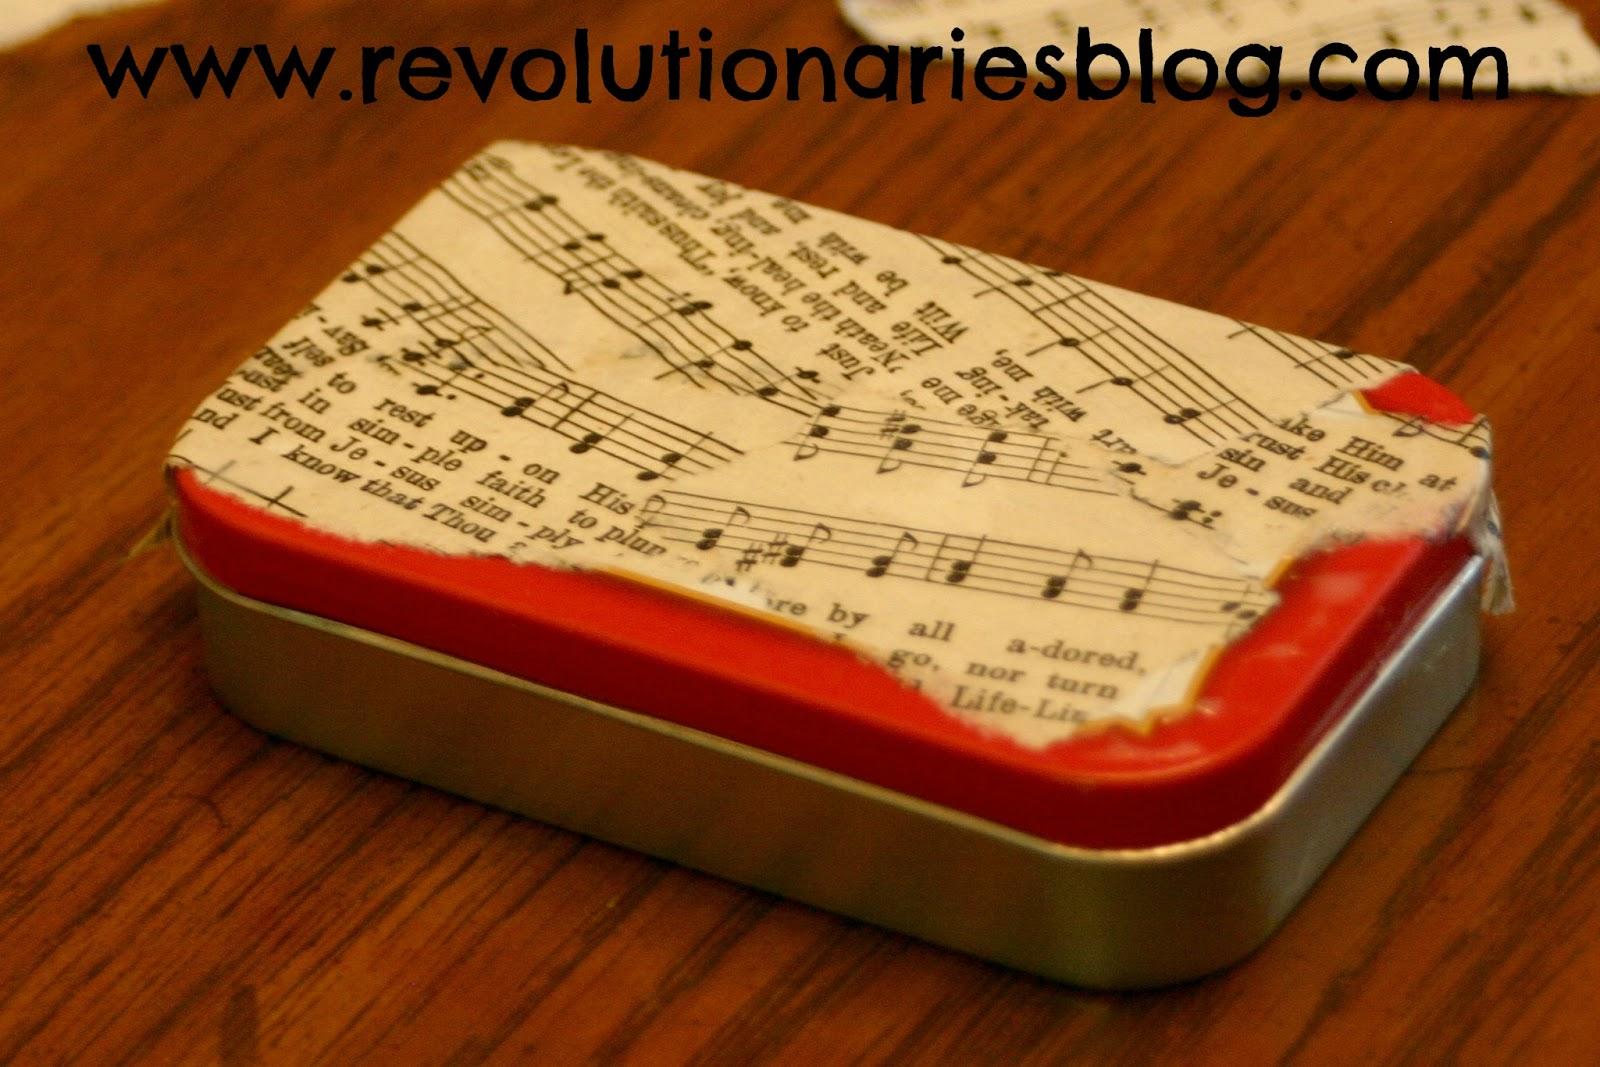 http://3.bp.blogspot.com/-nicCgPU4TfE/UI7KhoEQmoI/AAAAAAAABko/Q5o8nPvs2Qc/s1600/glue-sheet-music-to-altoids-tin.jpg